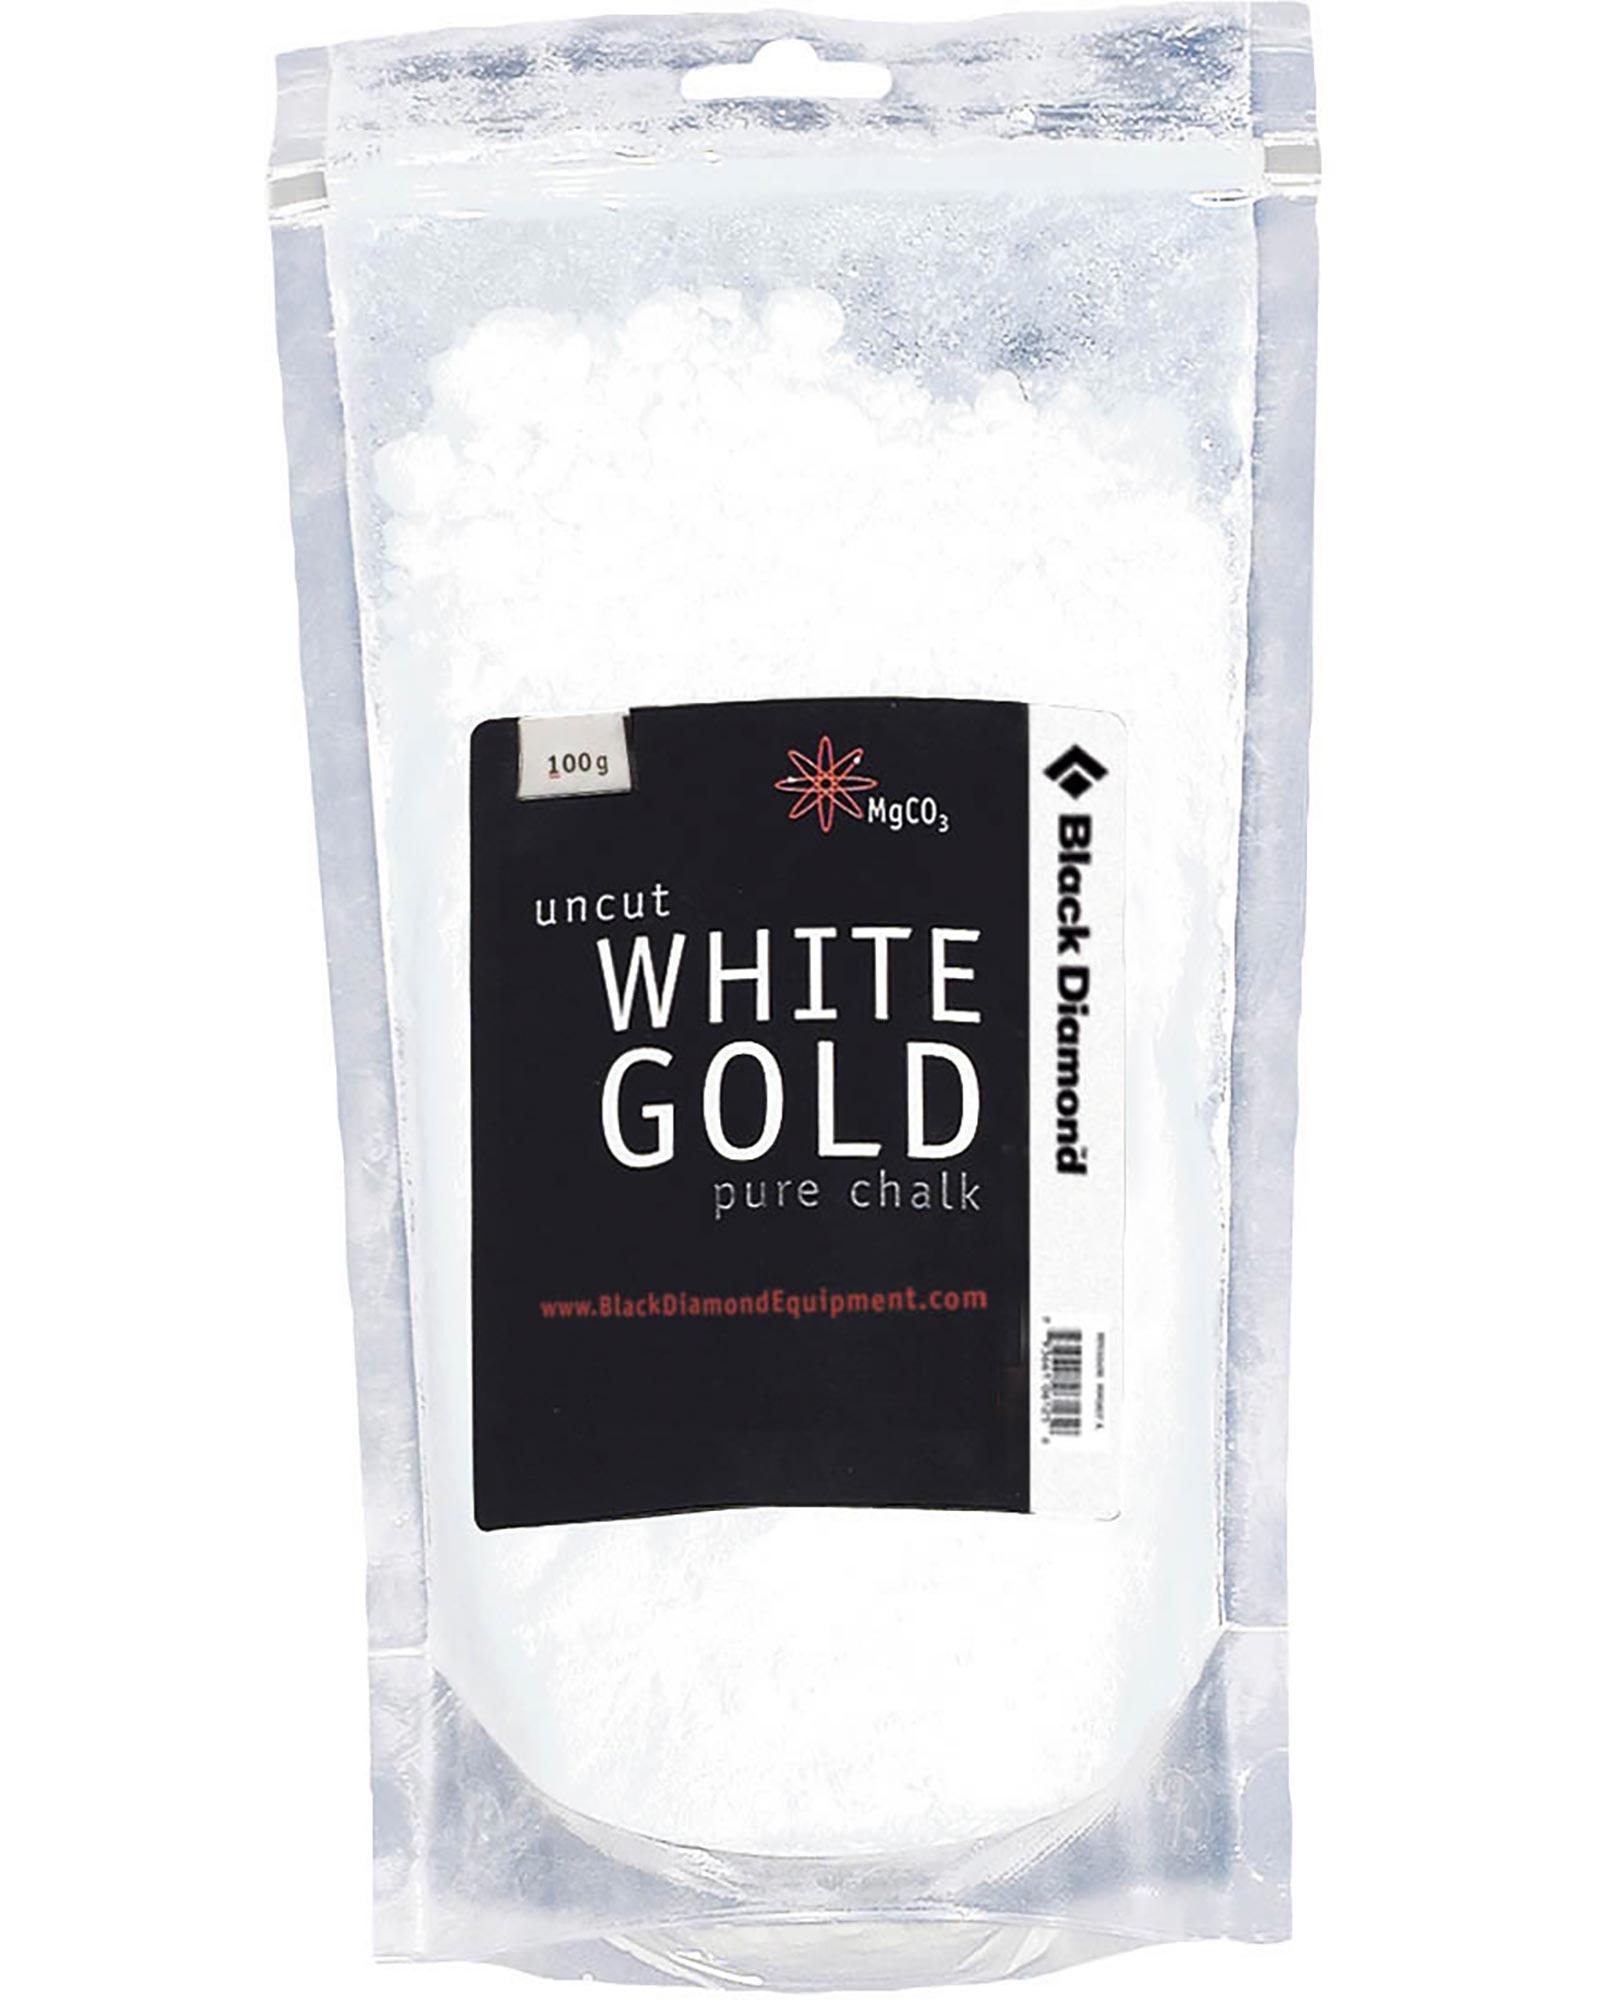 Black Diamond White Gold 100g Loose Chalk 0